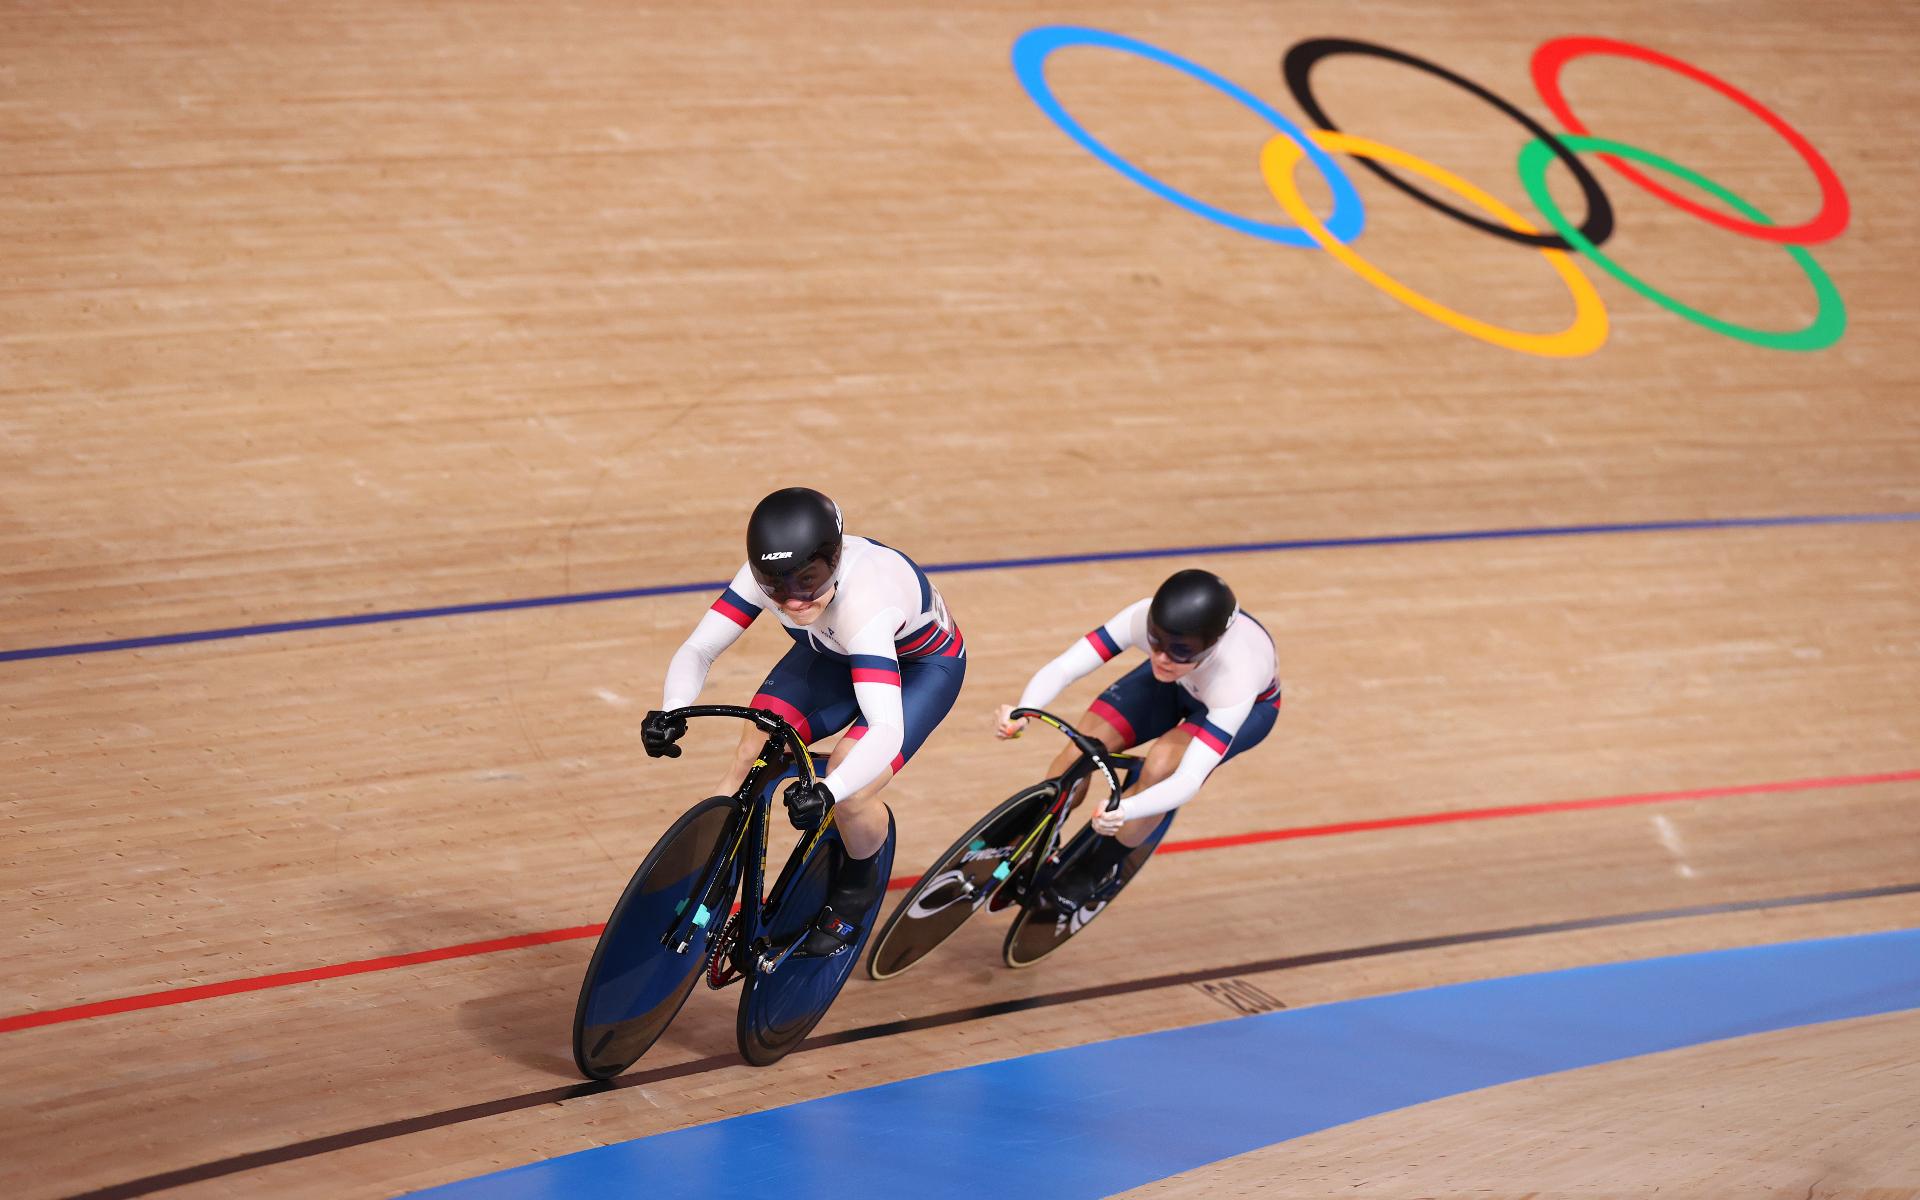 Фото: Дарья Шмелева и Анастасия Войнова (Justin Setterfield/Getty Images)